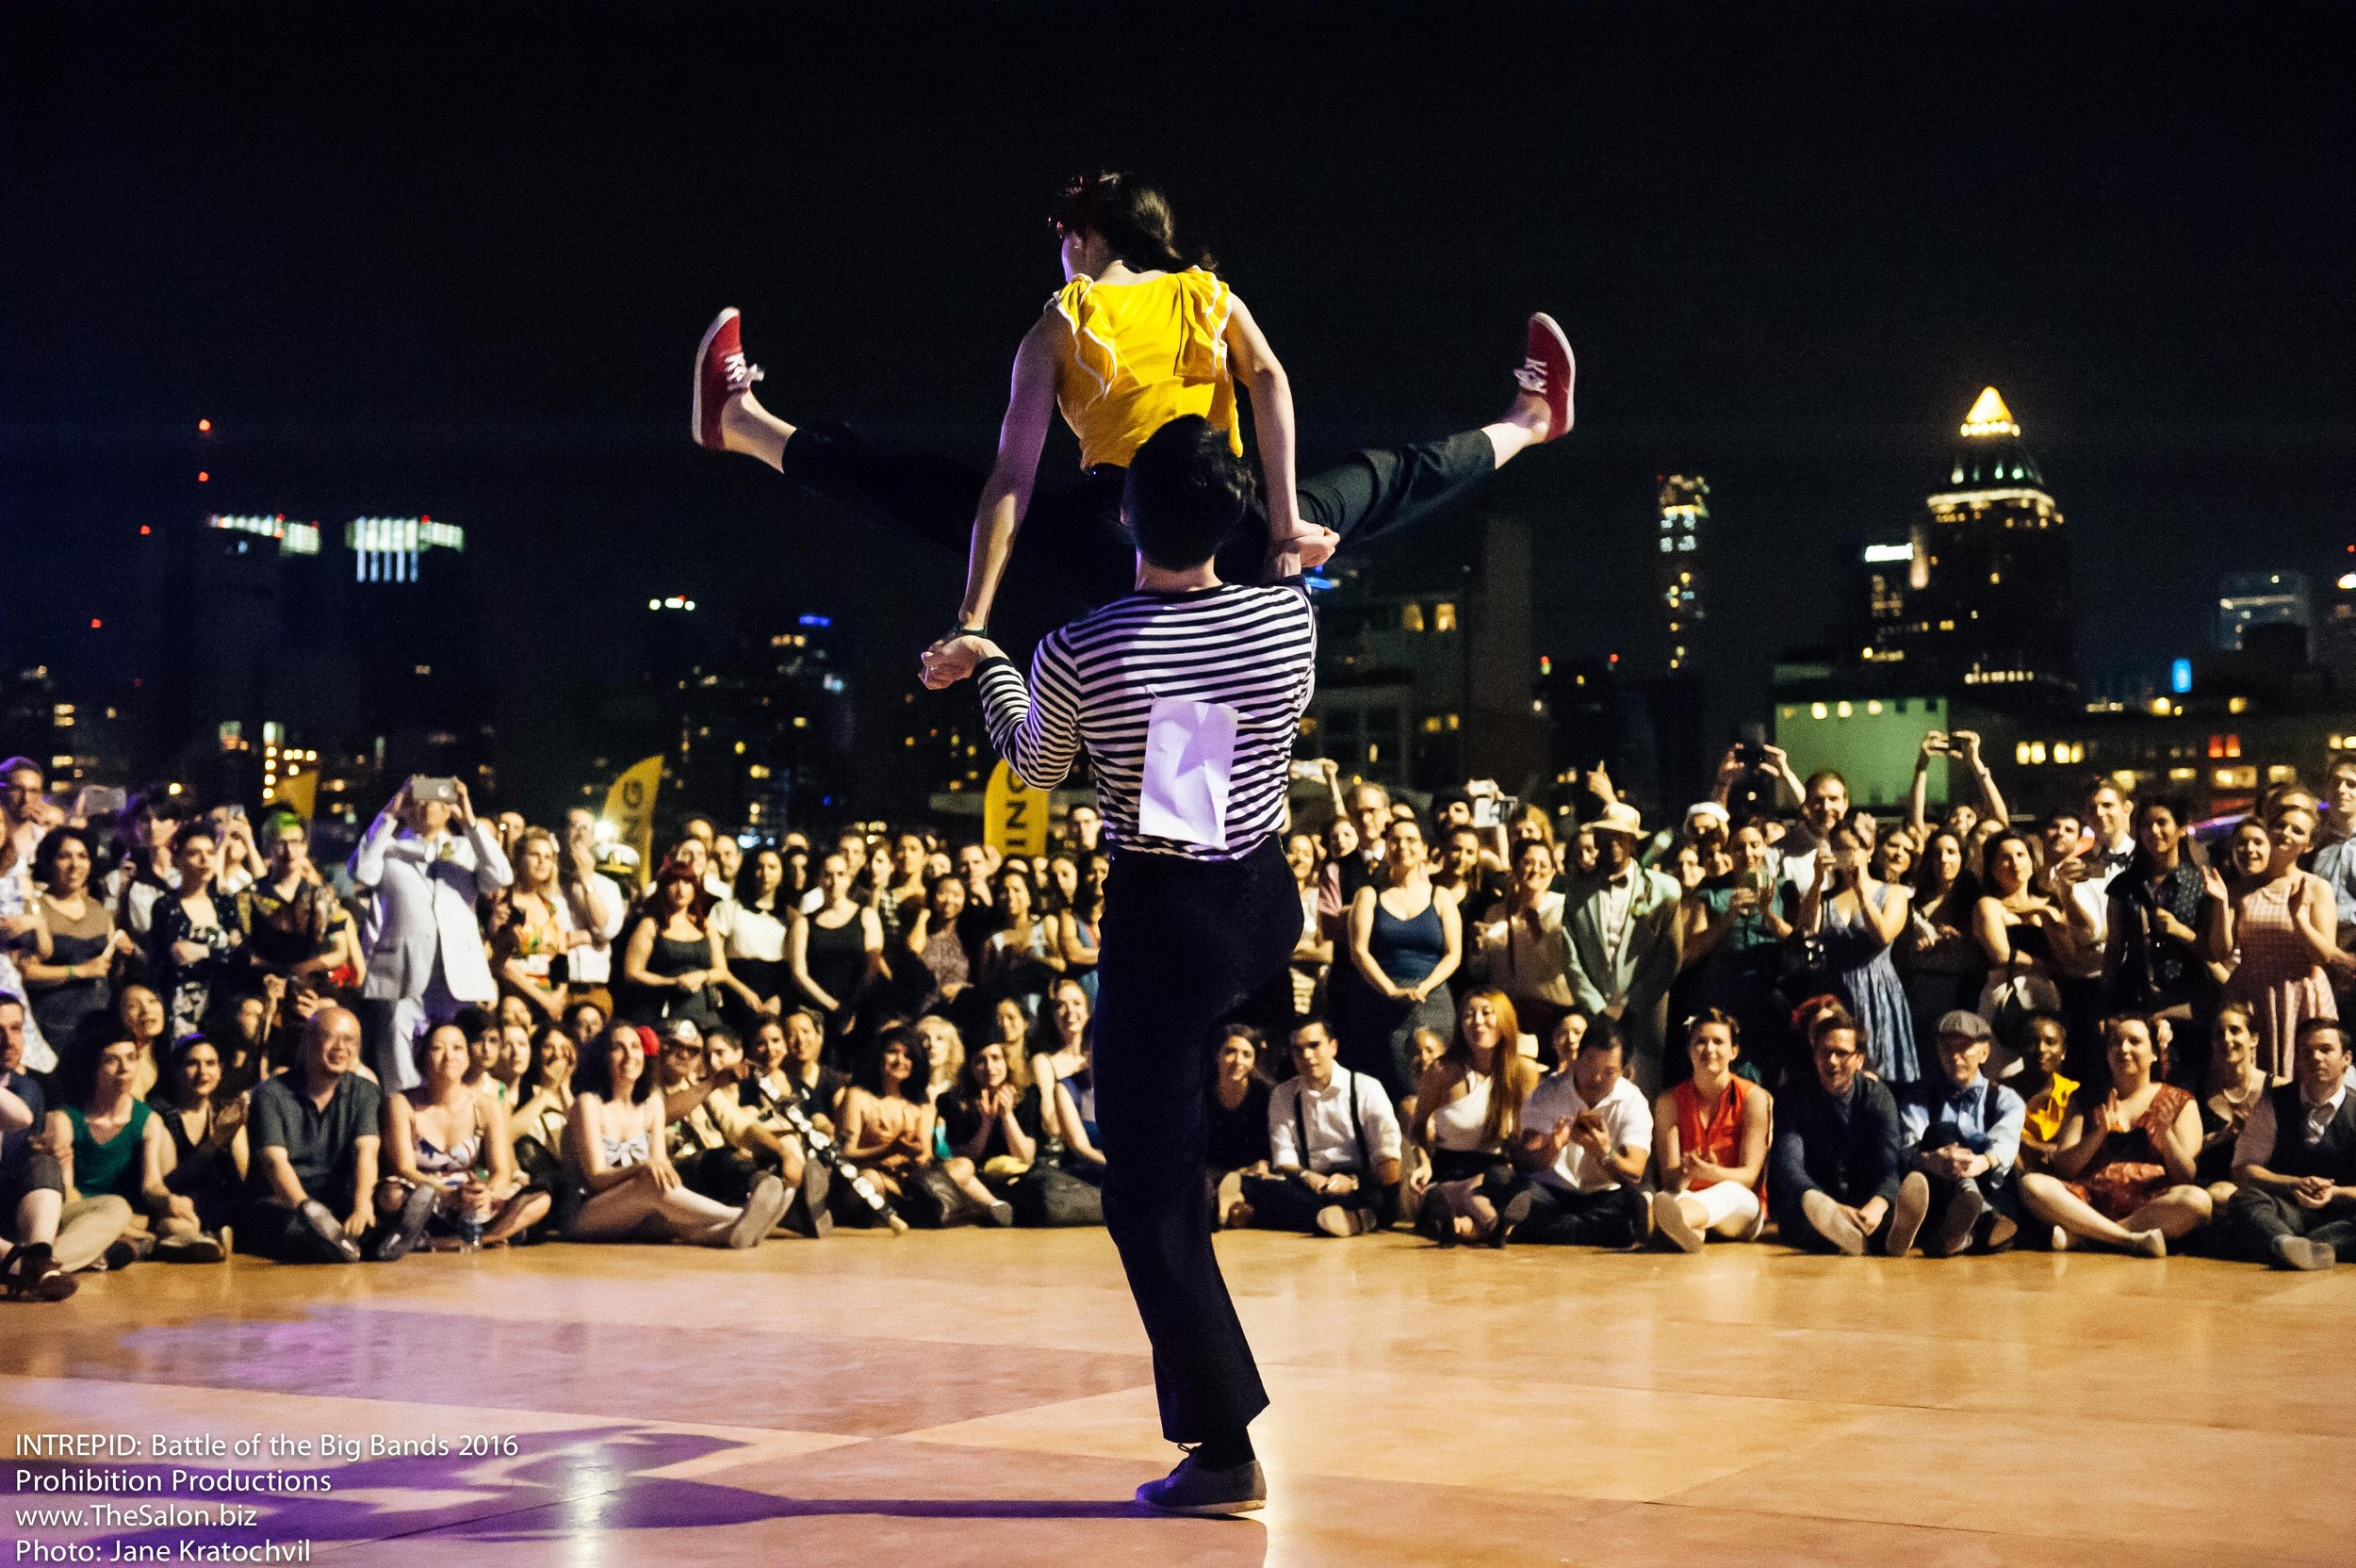 **INTREPID_BattleOfTheBigBands_MAY2016_jkratochvil_6209-dancecomp.jpg